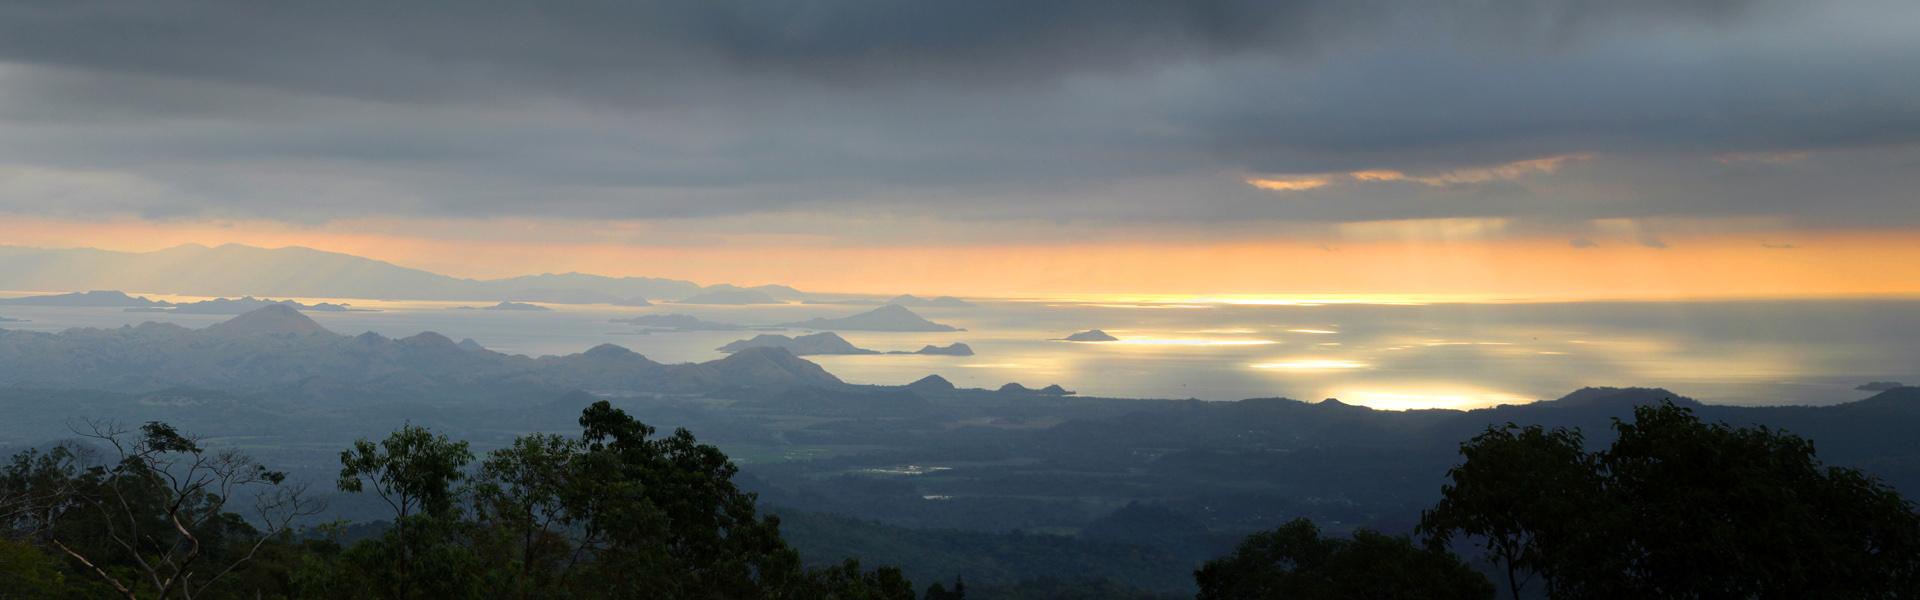 Sunset over the Komodo National Park, Indonesia